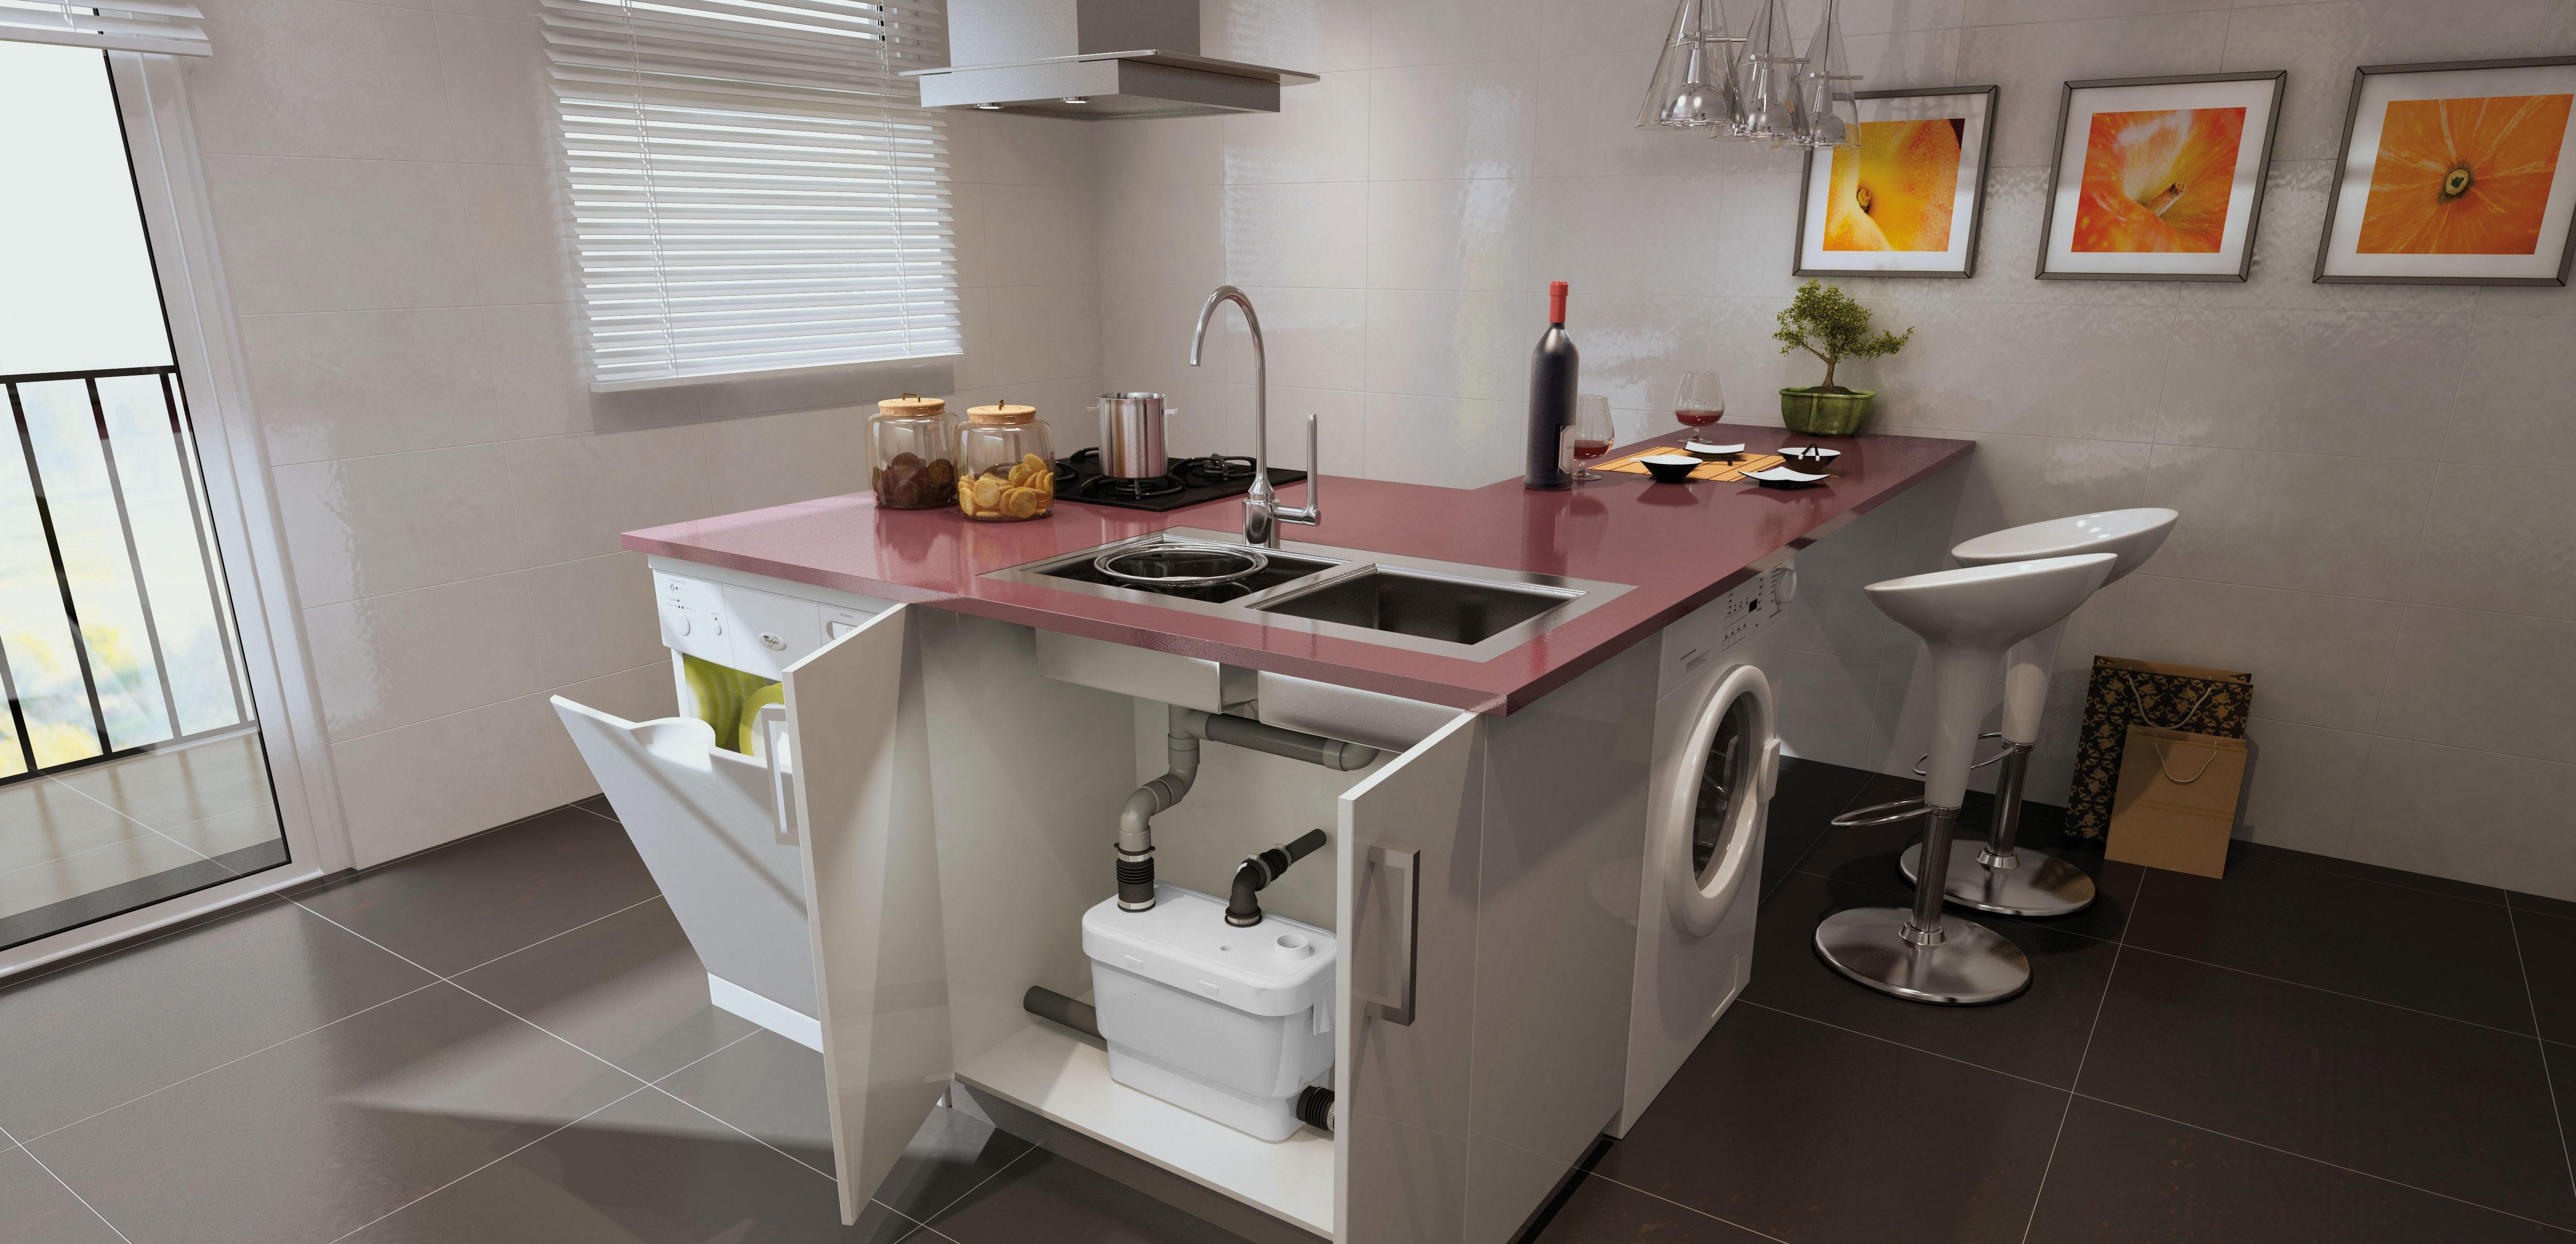 sanibroyeur ruim assortiment op voorraad. Black Bedroom Furniture Sets. Home Design Ideas